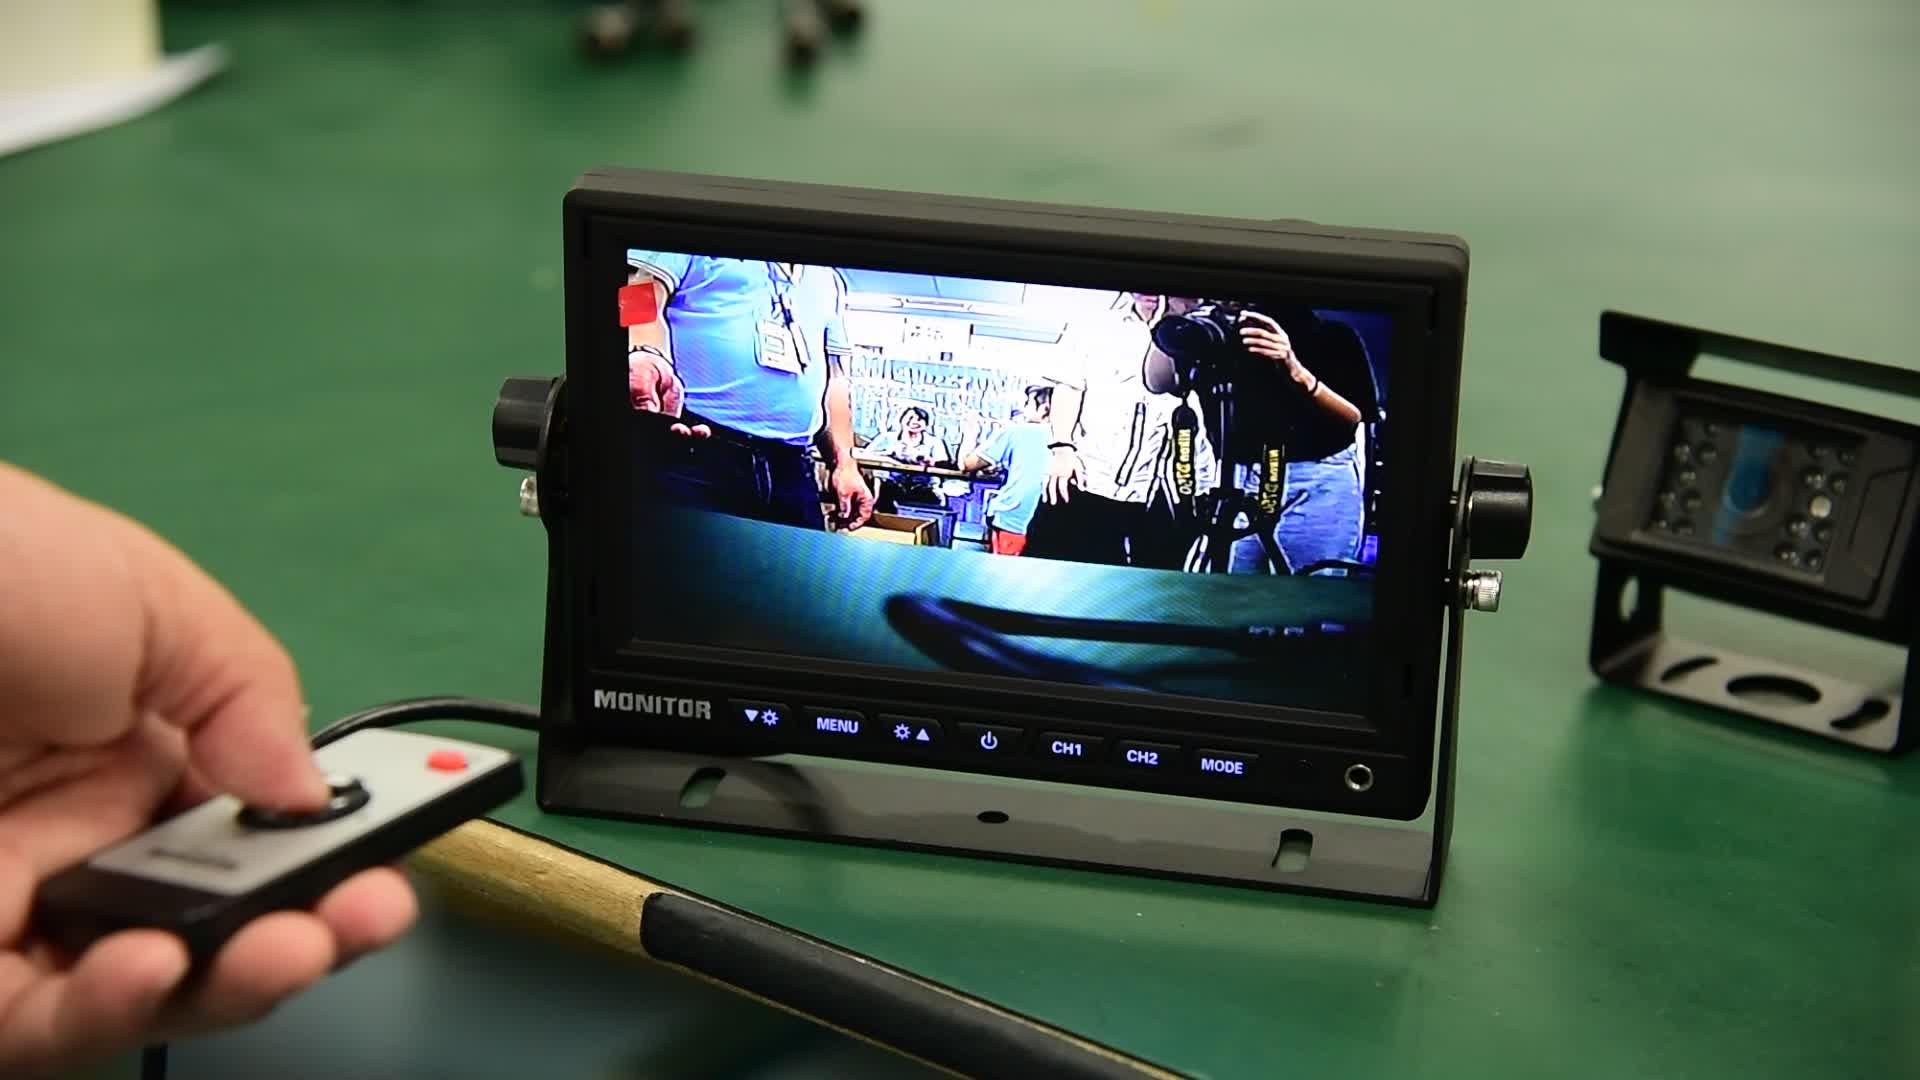 OEM עיצוב החדש אנדרואיד 7 אינץ HD LCD רכב צג טלוויזיה, וידאו משאית מצלמה מערכת